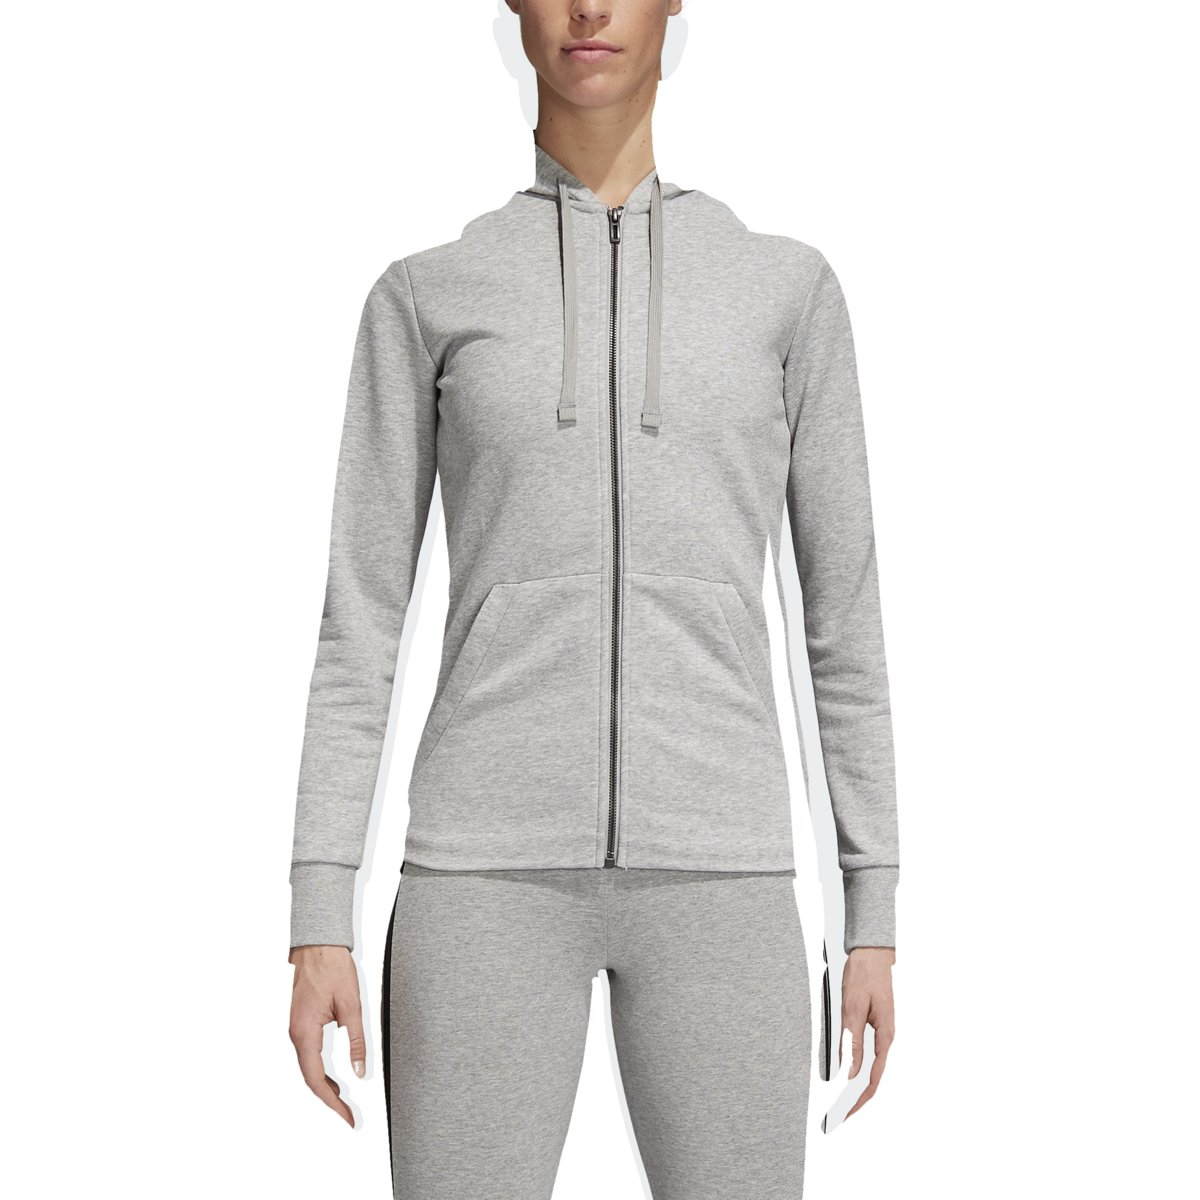 adidas Women's Essentials Linear Full Zip Hoodie Medium Grey Heather/High-Res Blue X-Small